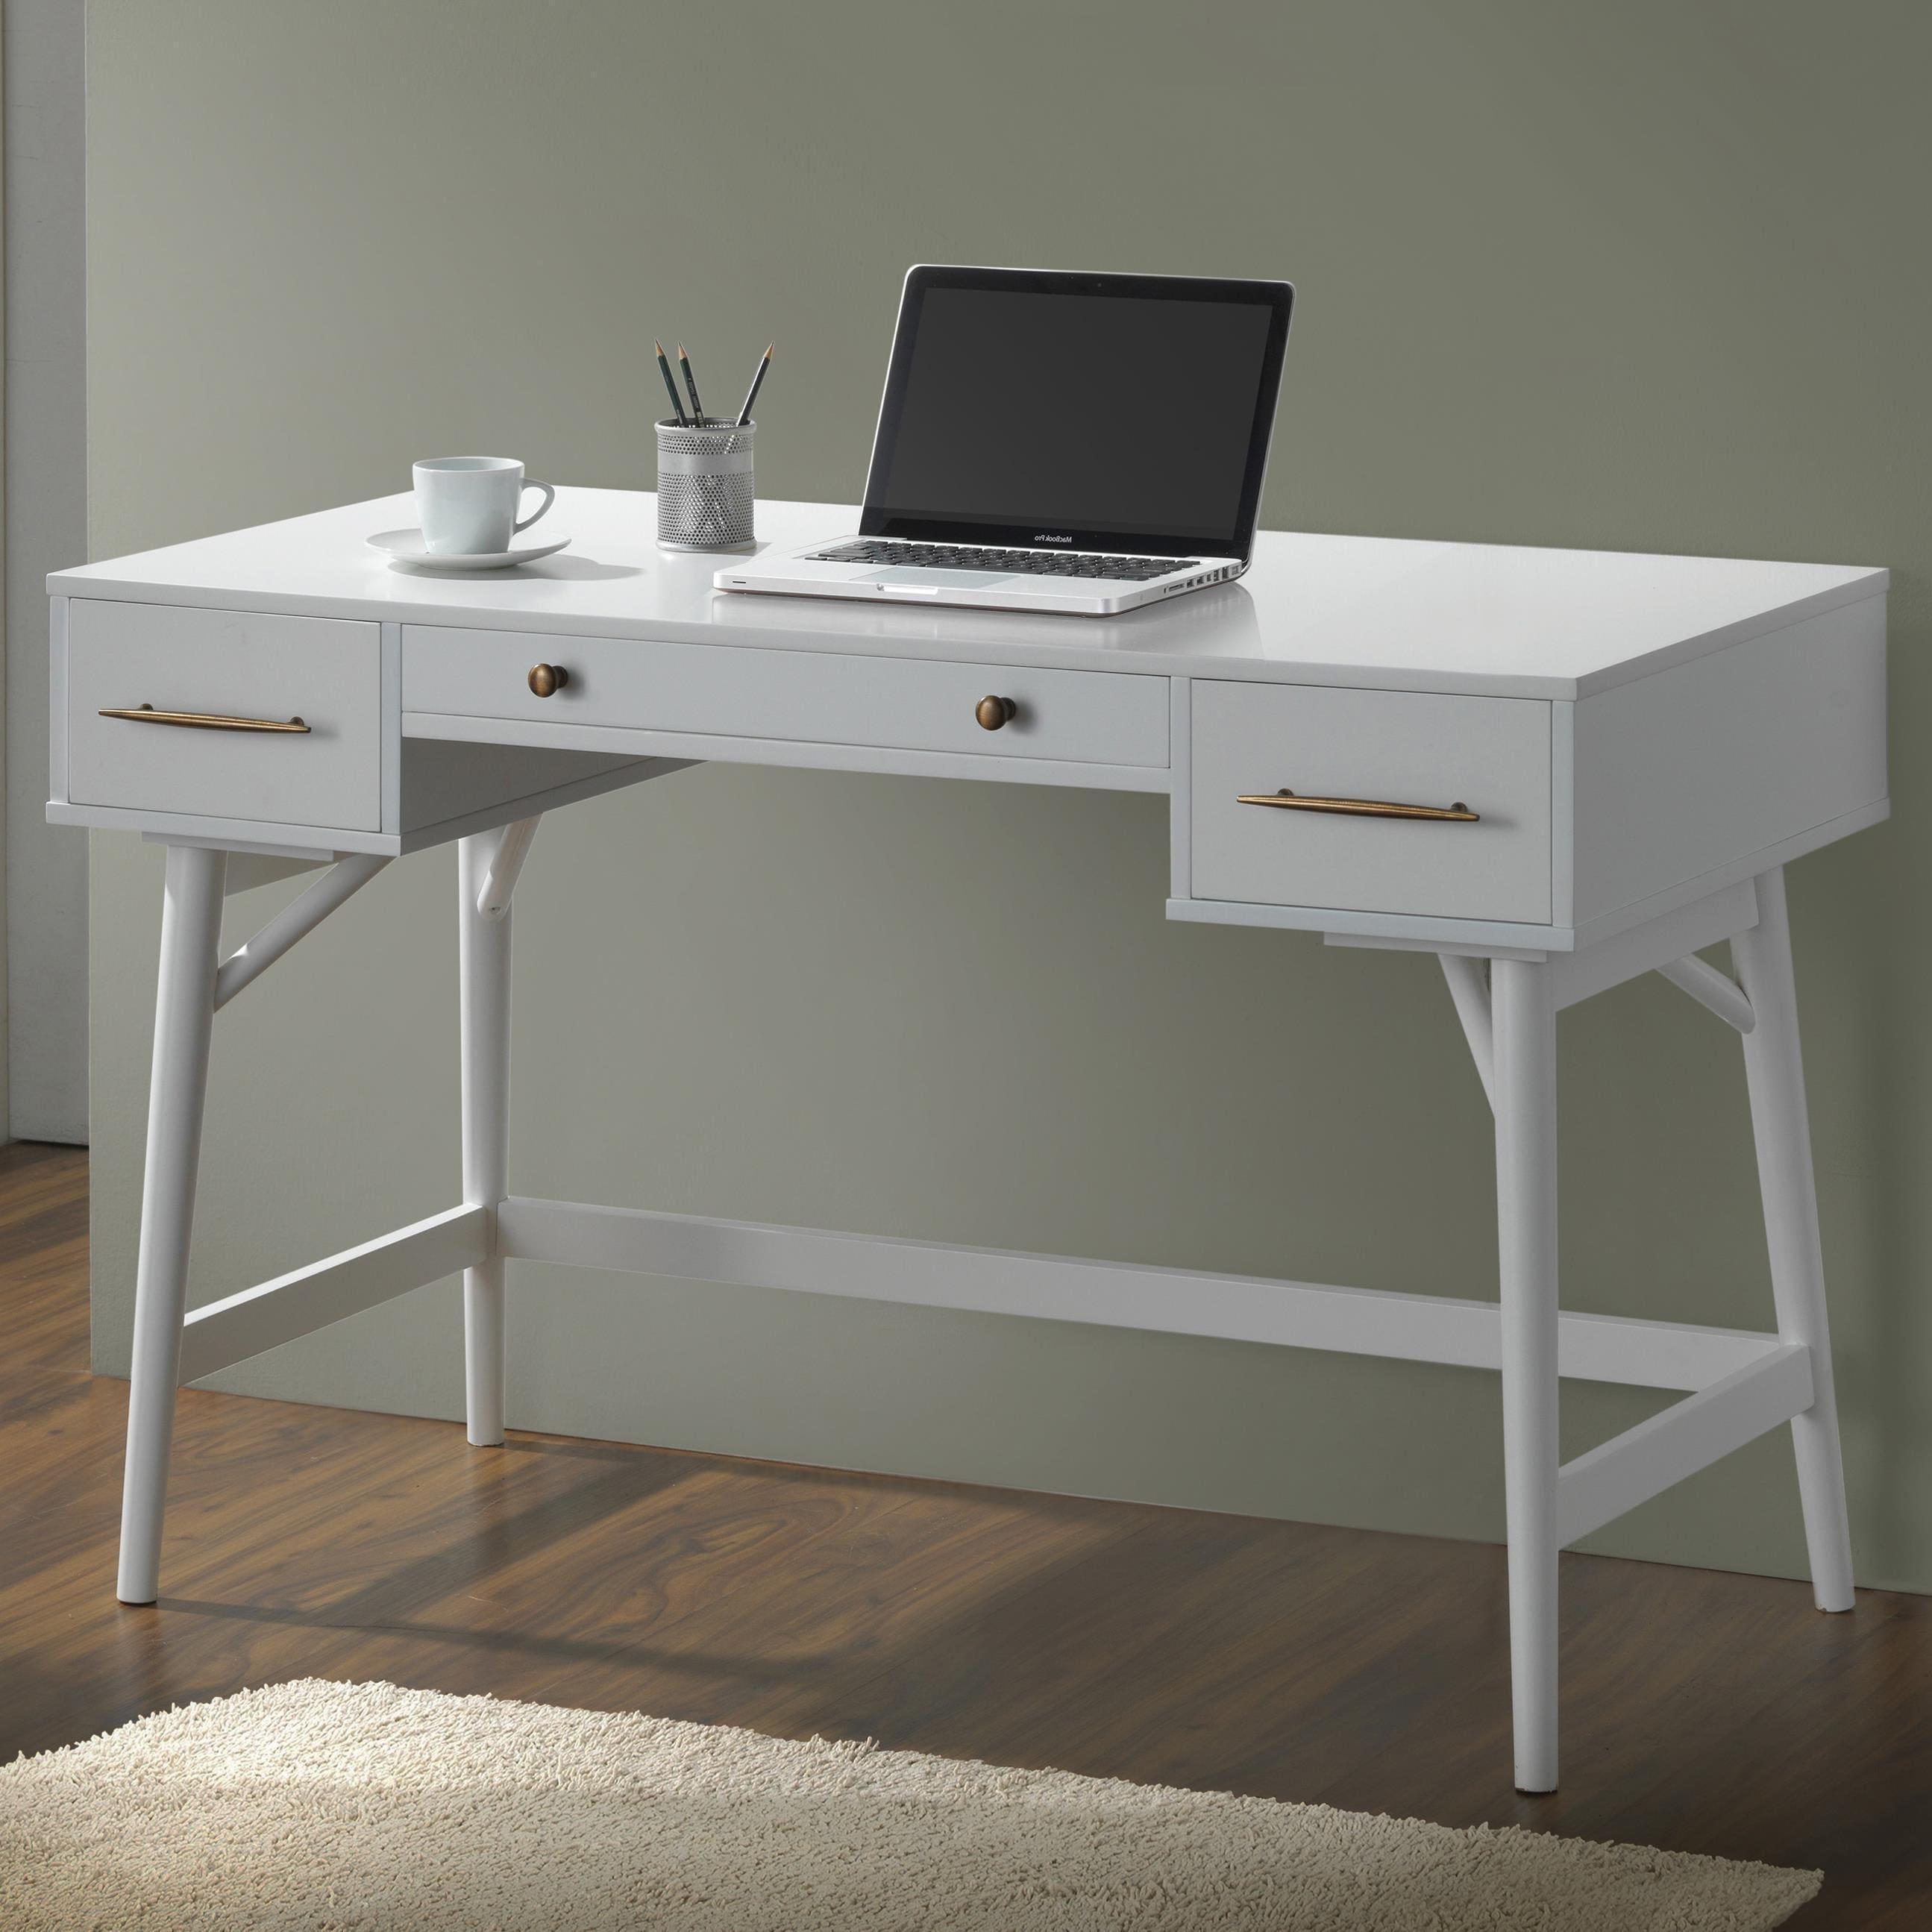 Groovy Shop Strick Bolton Monk Mid Century Writing Desk Free Interior Design Ideas Ghosoteloinfo